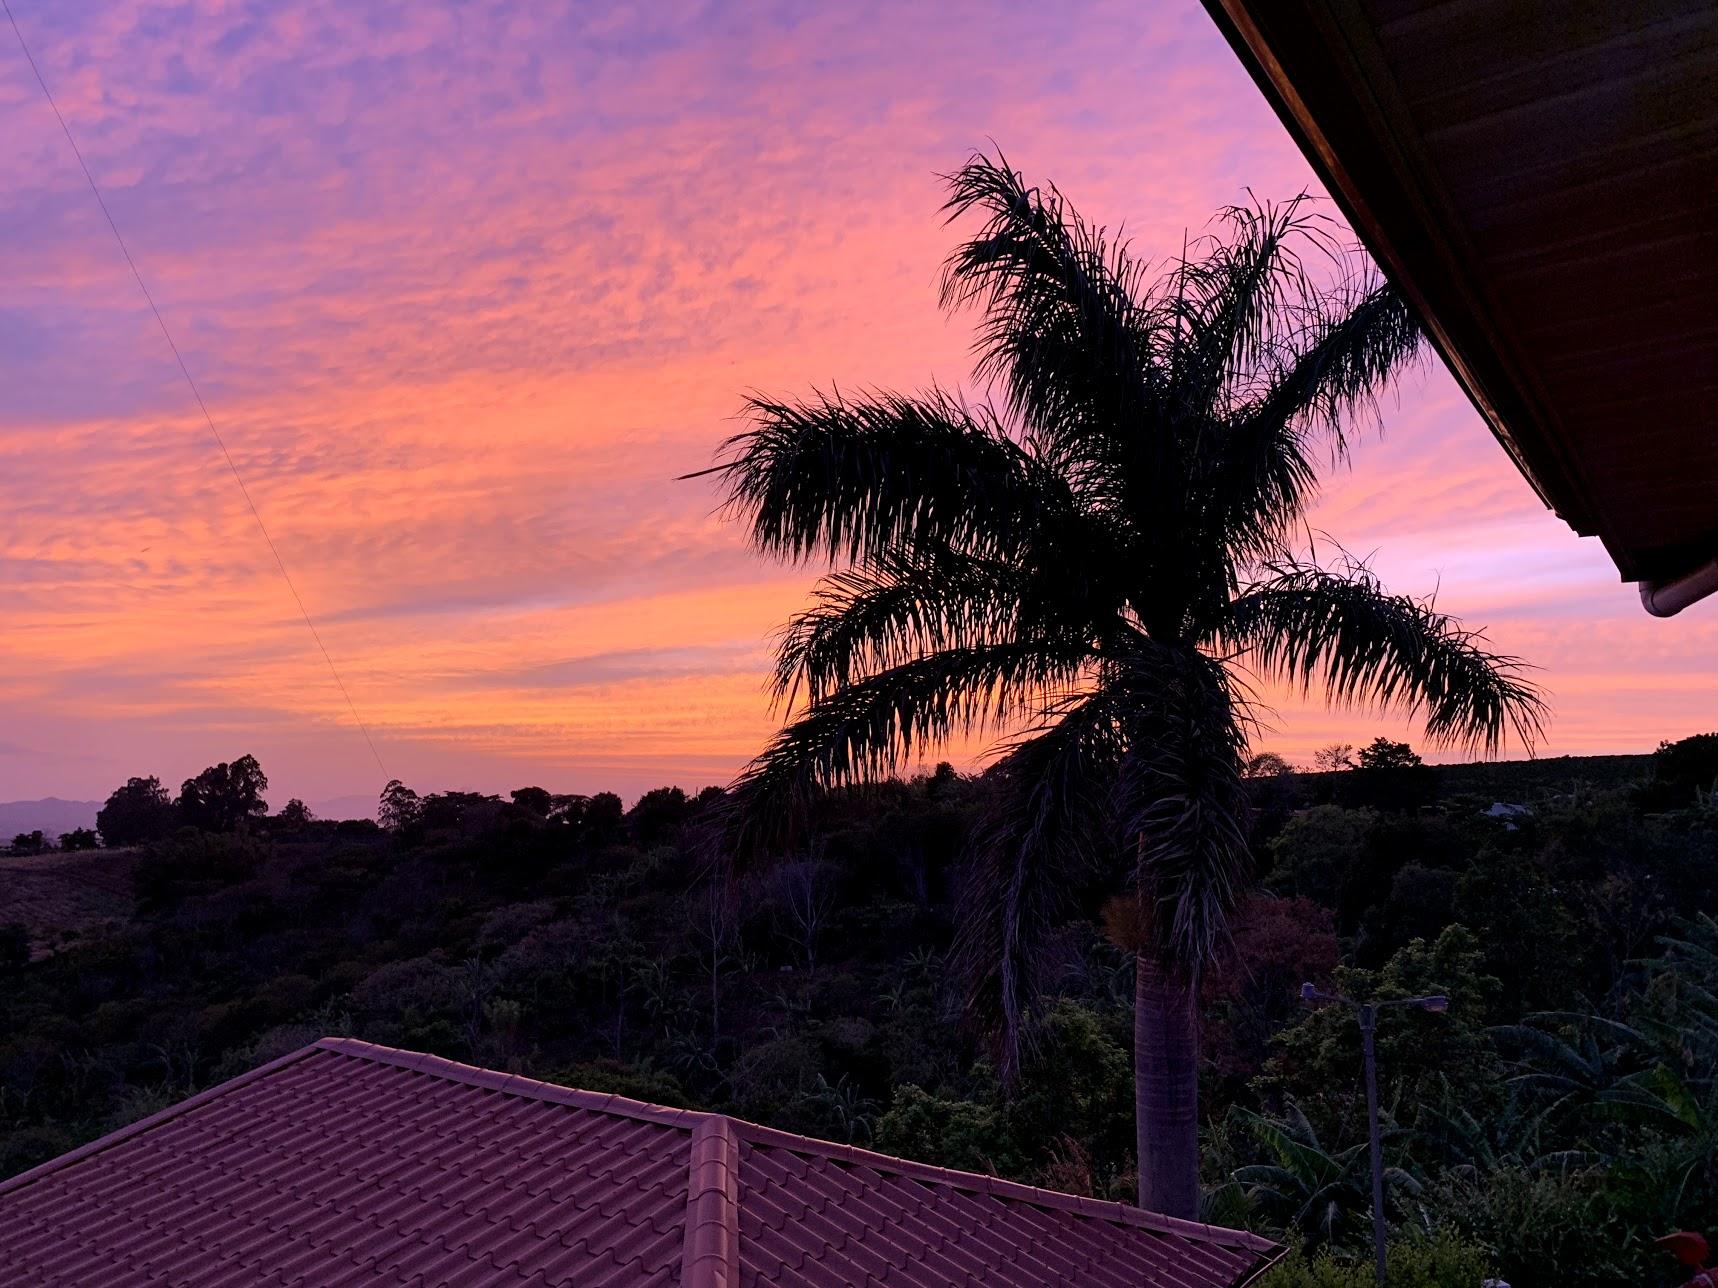 Ferg's trip to Costa Rica